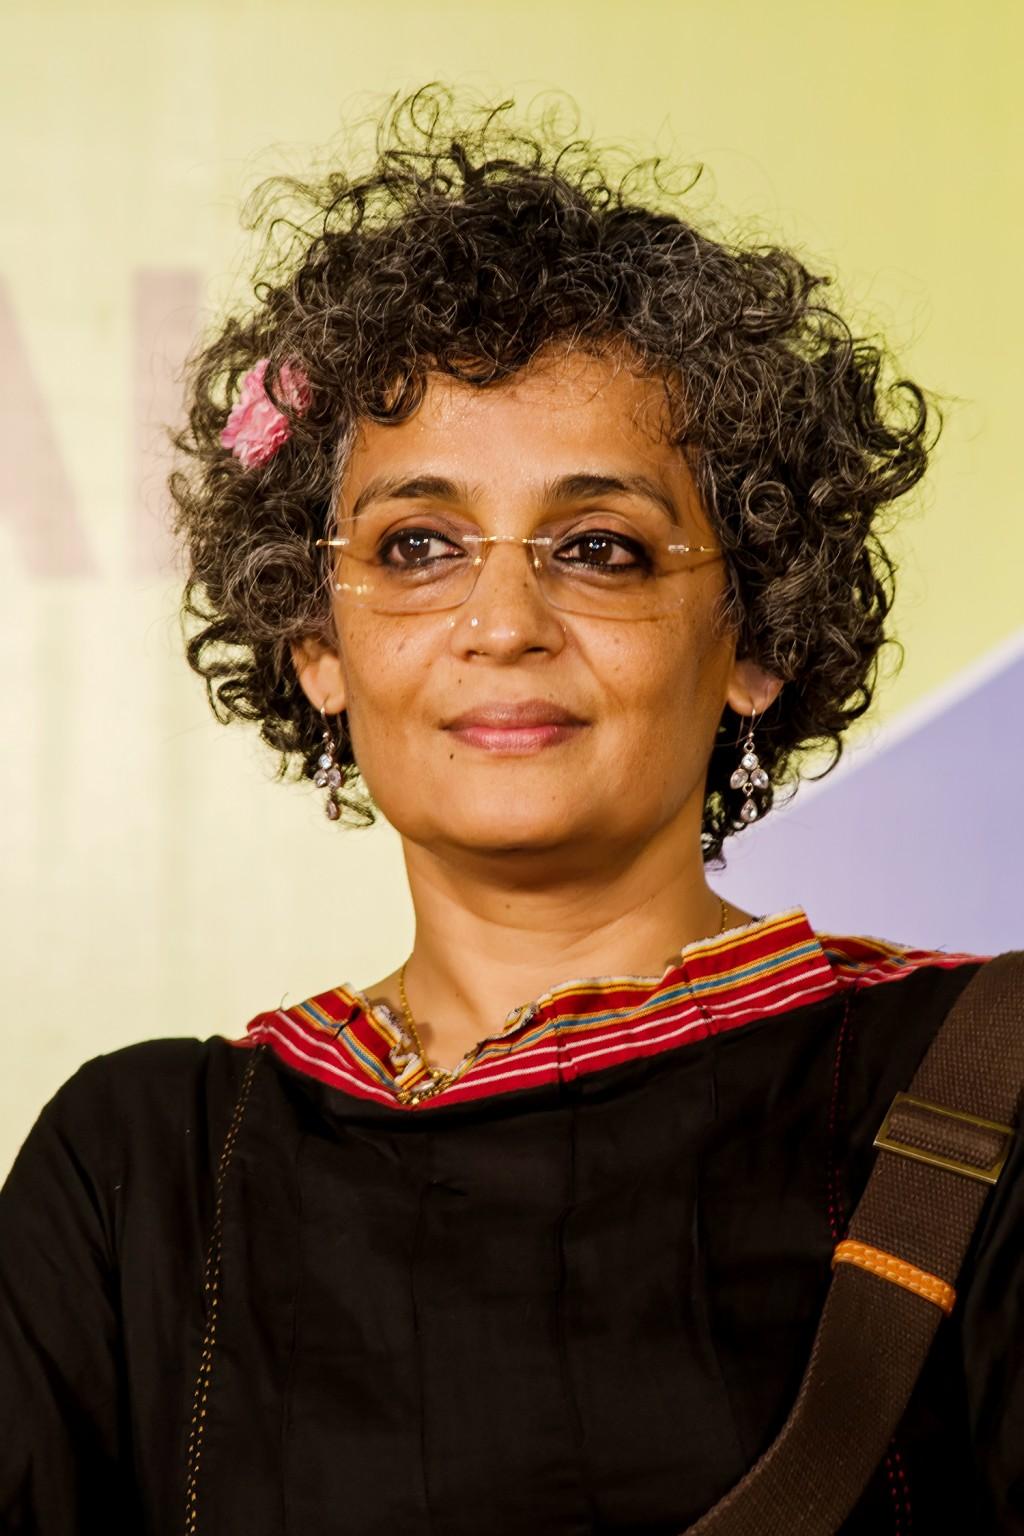 002 Arundhati Roy W Essays By Essay Sensational Large